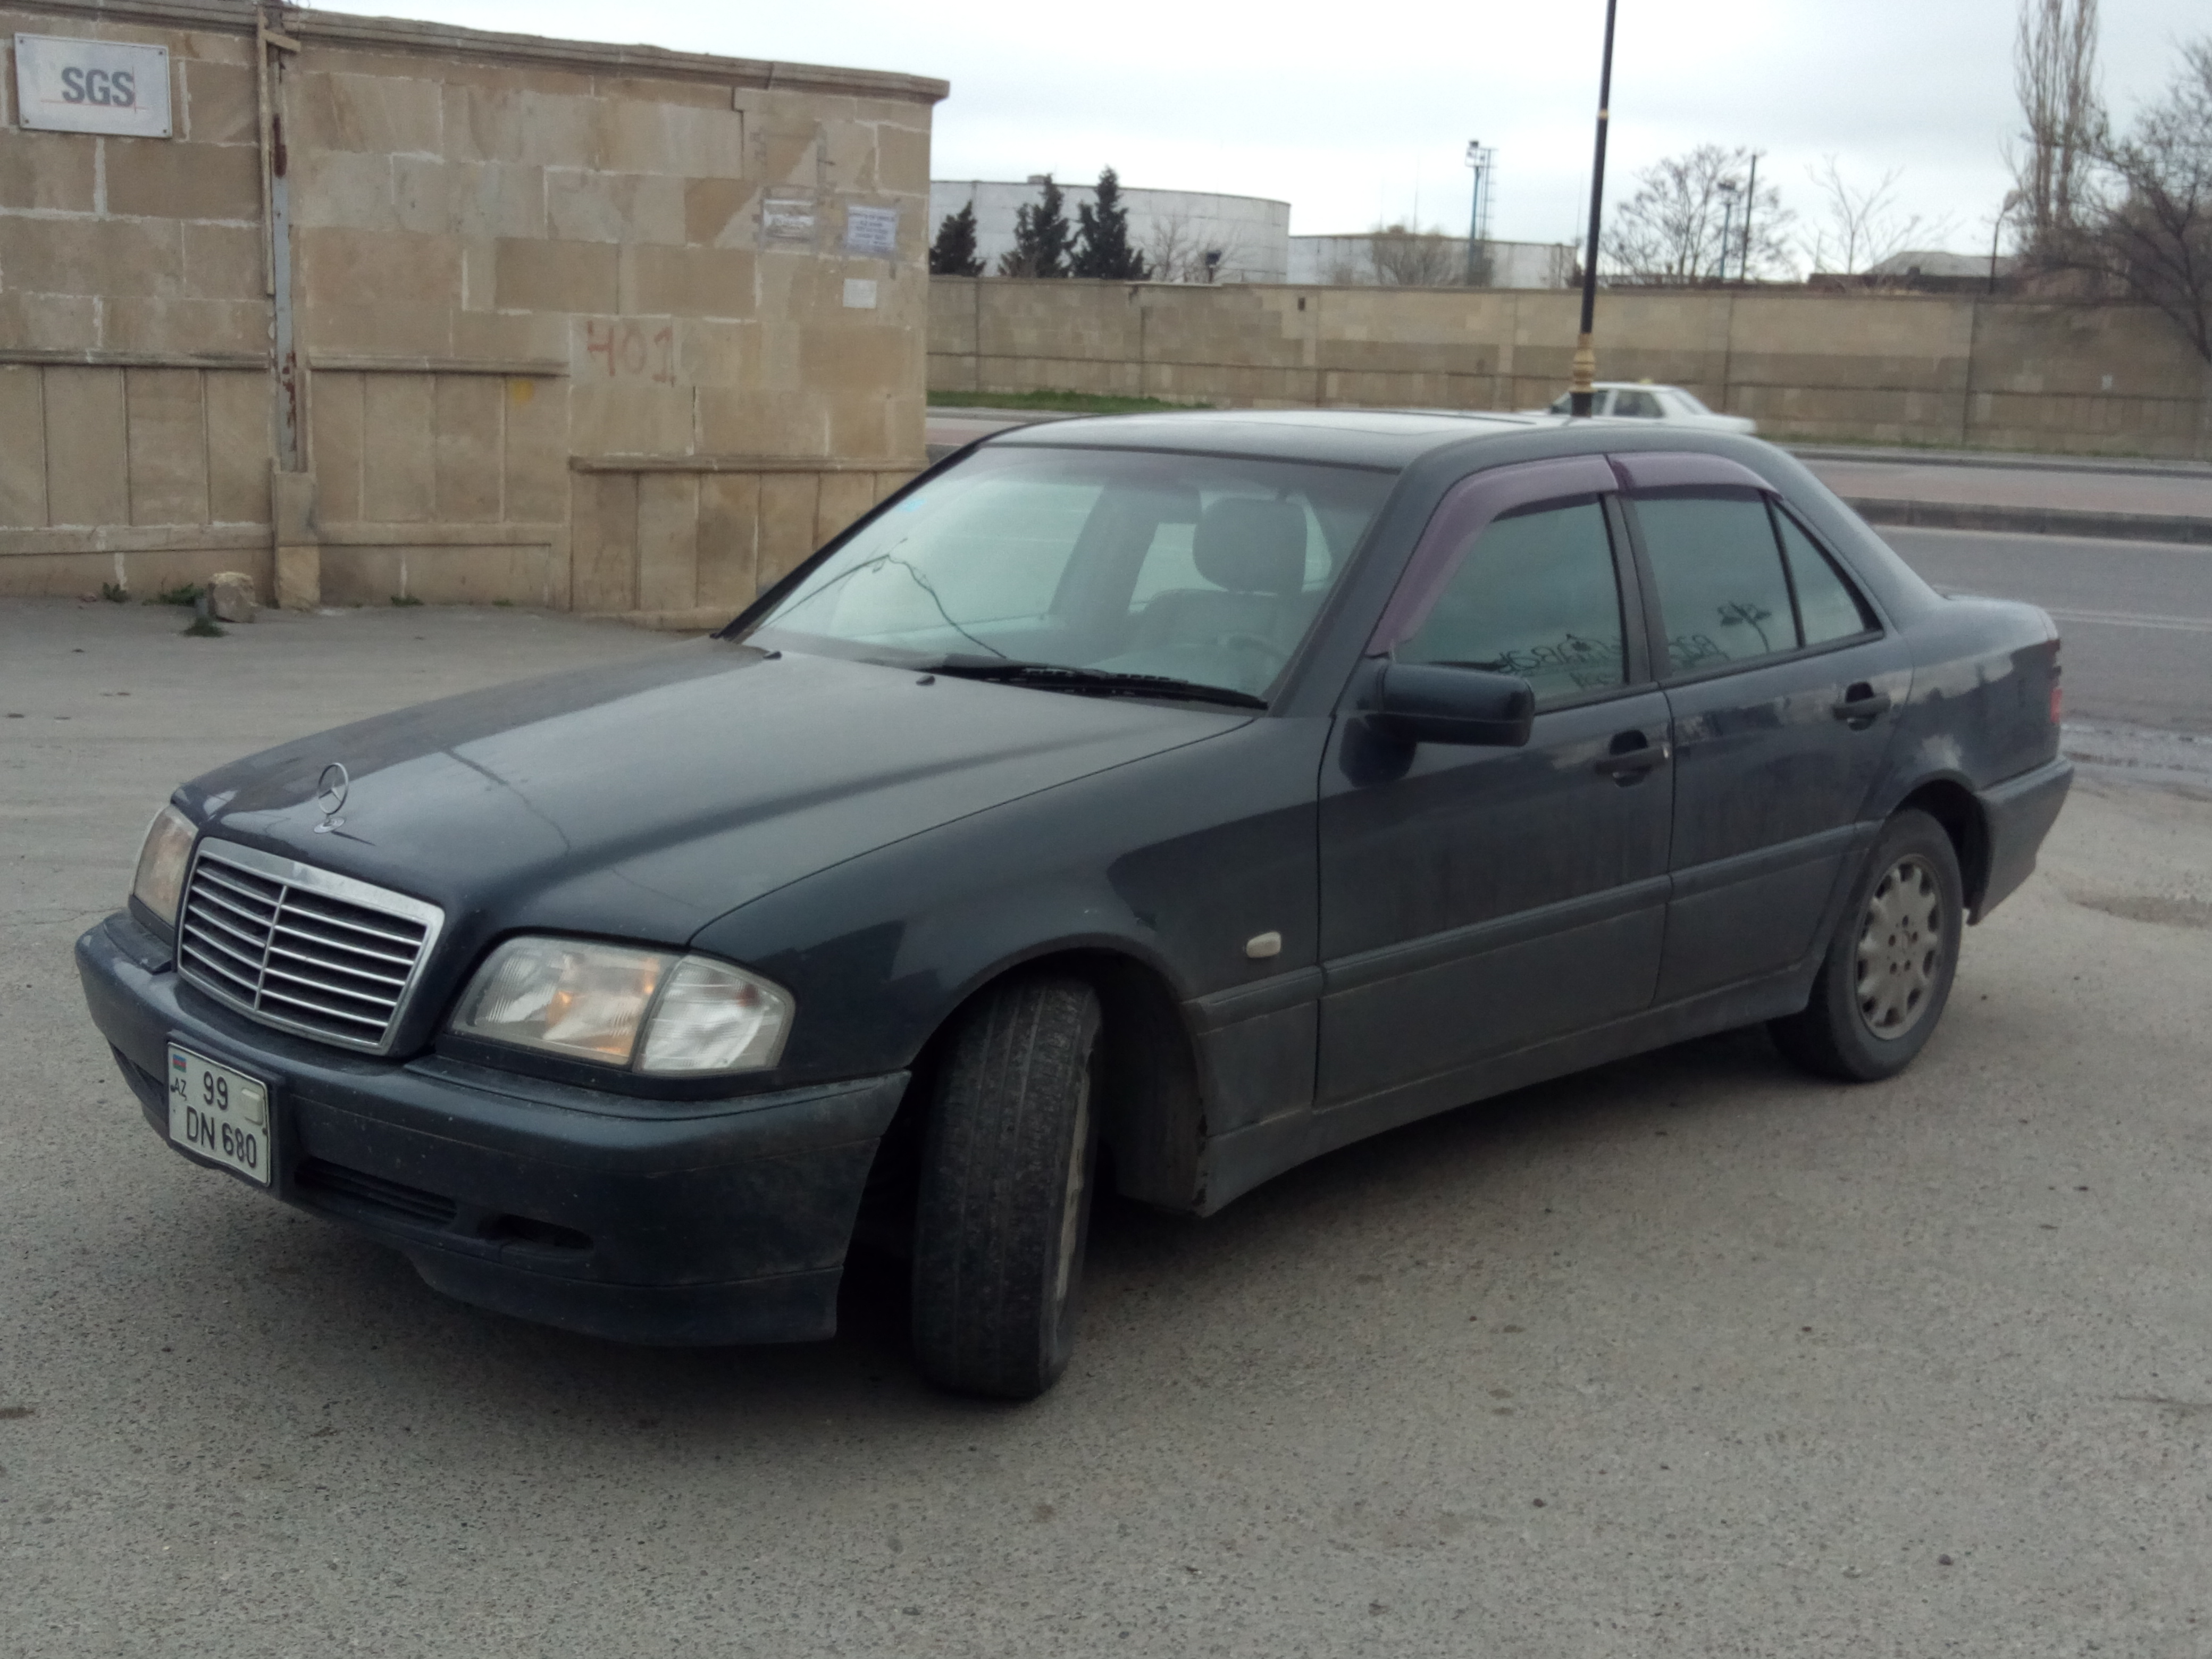 Mercedes-Benz C 200 2.0(lt) 1999 Second hand  $12500